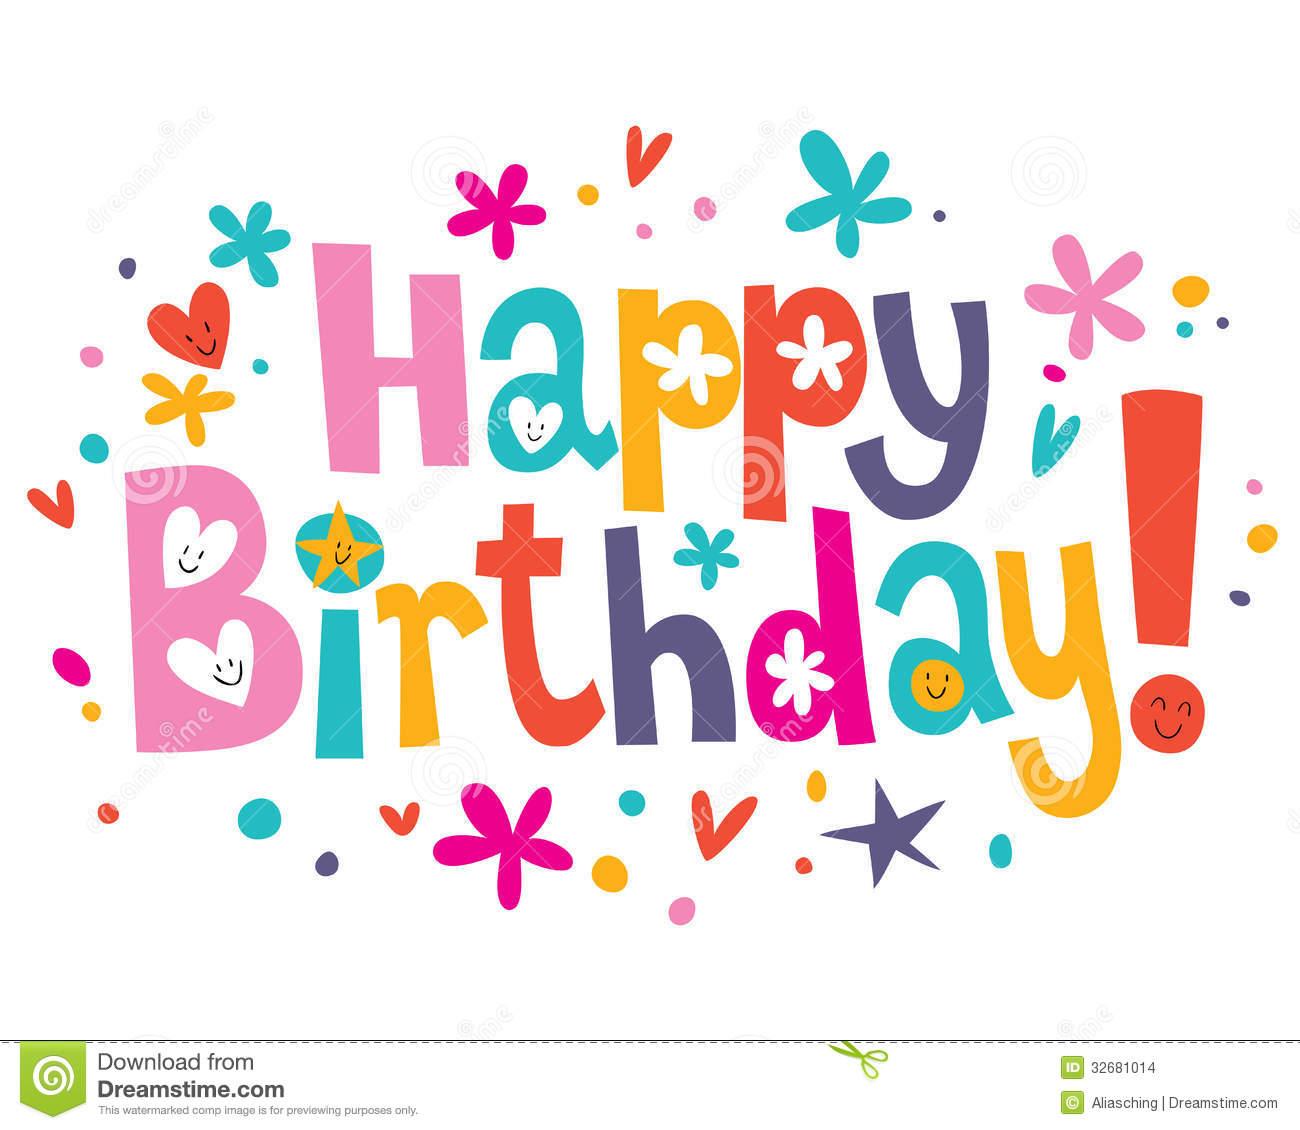 Happy Birthday Text On Erfly Happy Birthday Text Art Happy Birthday Wishes Text